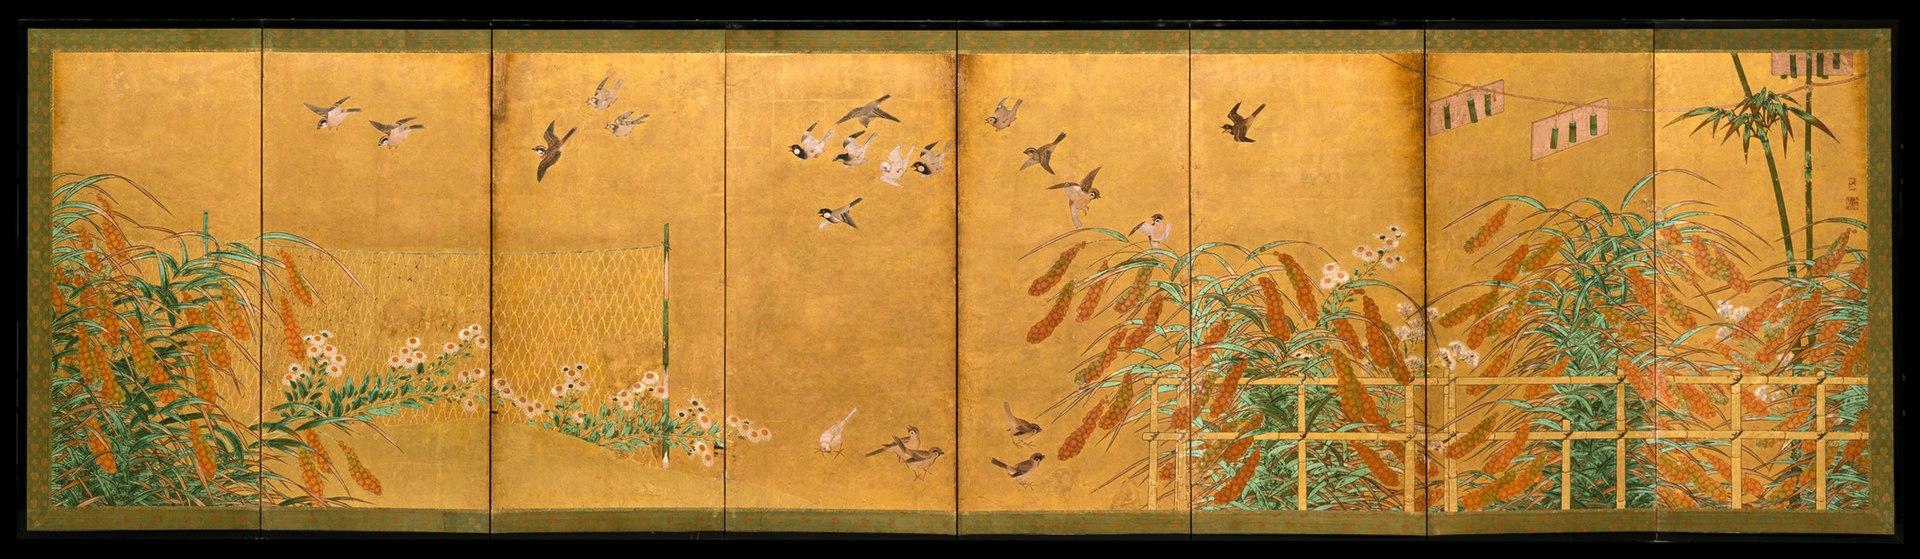 1920px-伝狩野山楽筆_粟に小禽図屏風-Autumn_Millet_and_Small_Birds_MET_DT1589.jpg